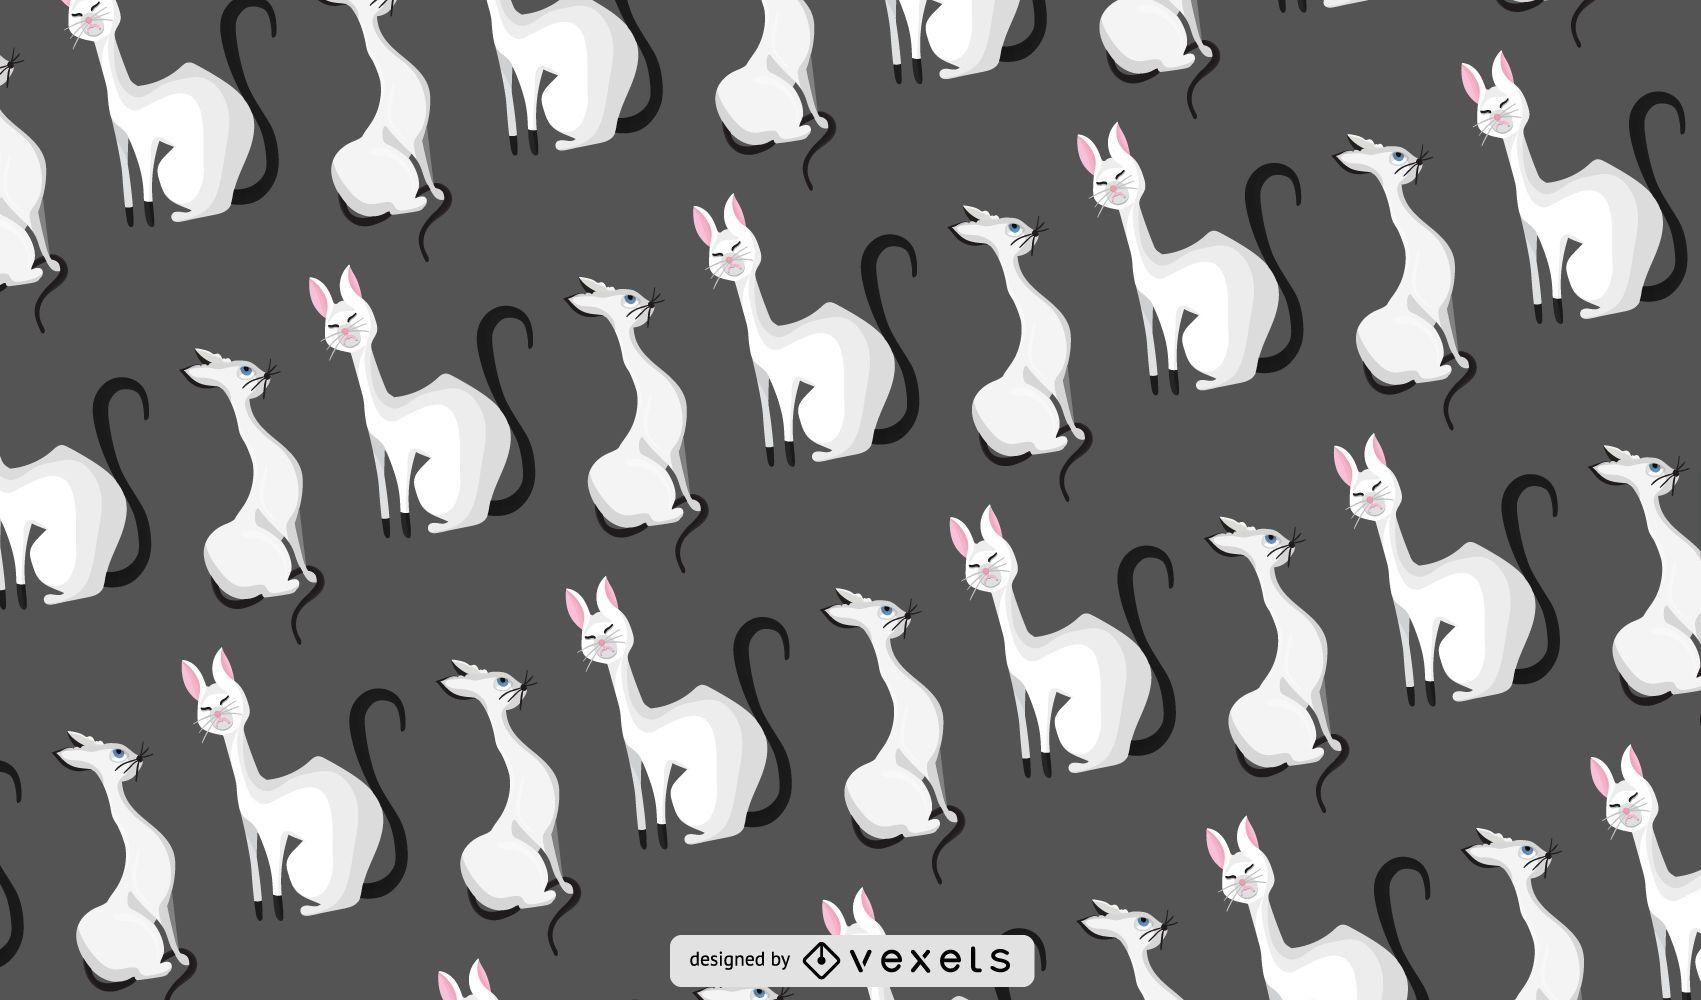 Classy cats pattern